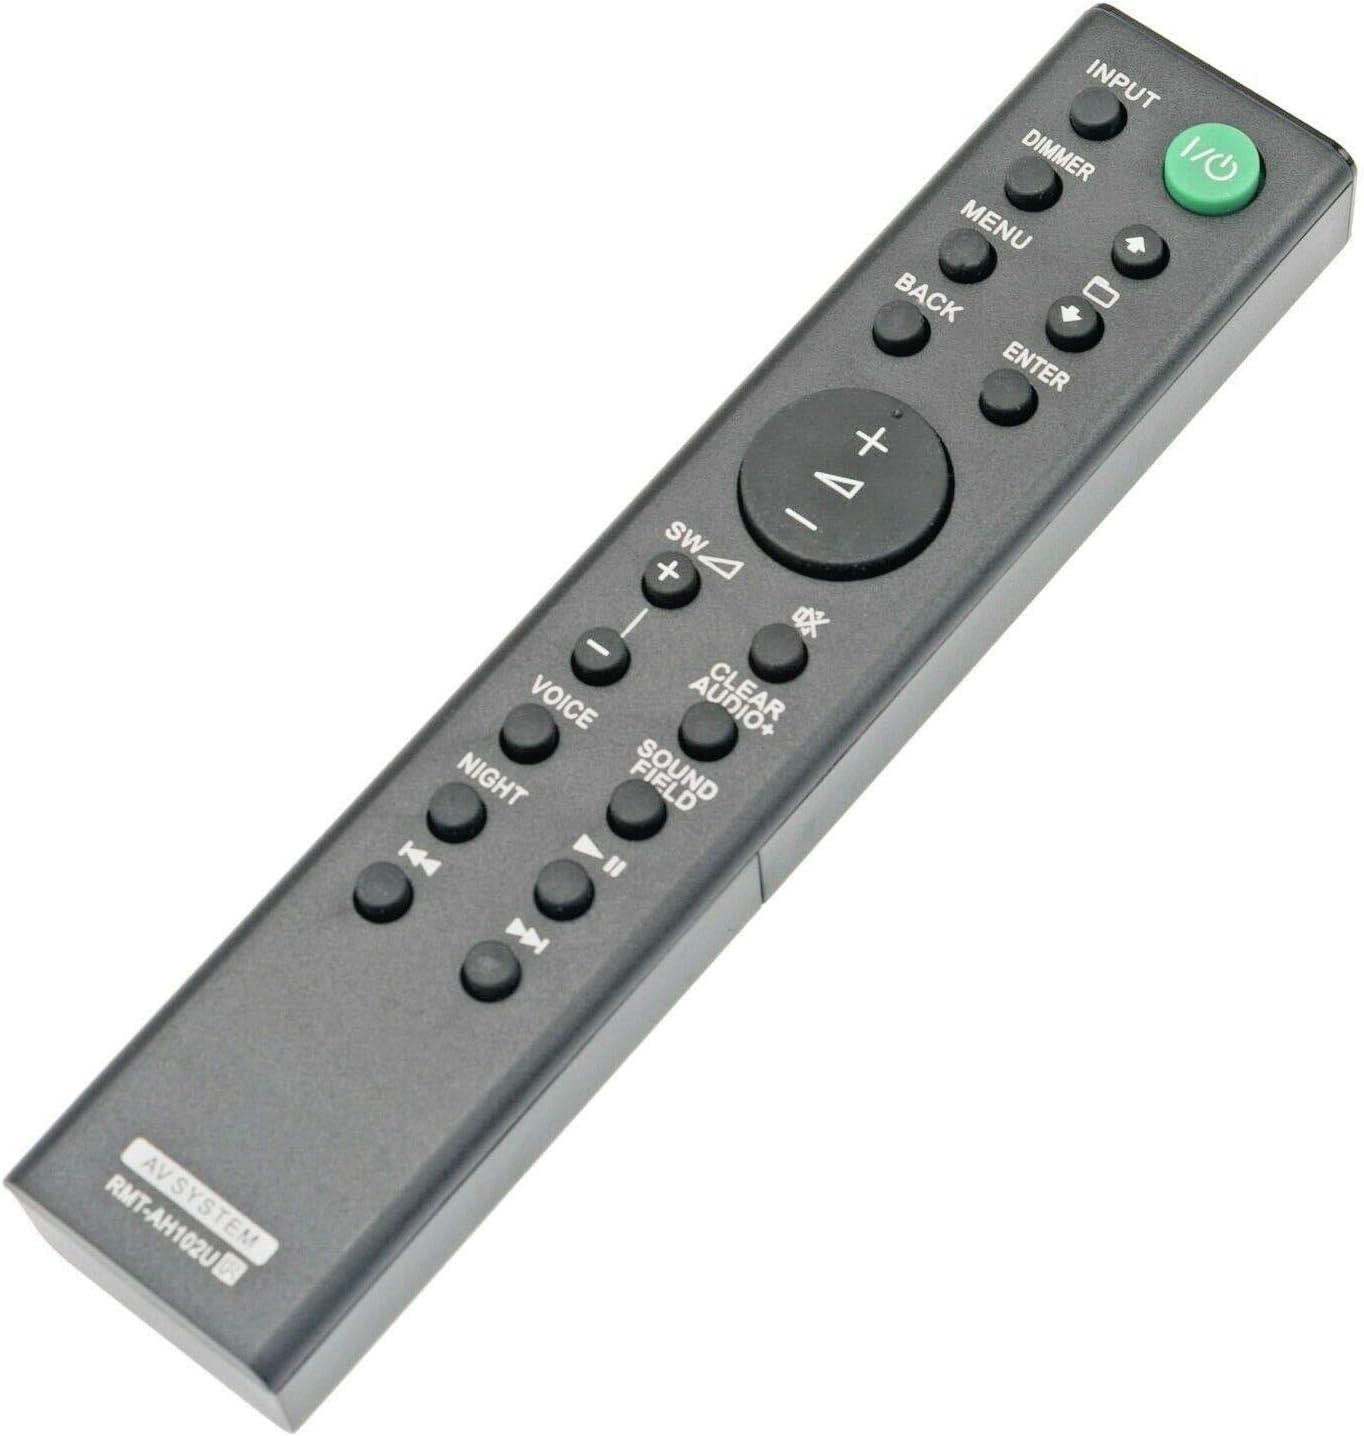 Remote Control RMT-AH102U RMTAH102U for Sony AV System HT-XT100 HTXT100 Replaced